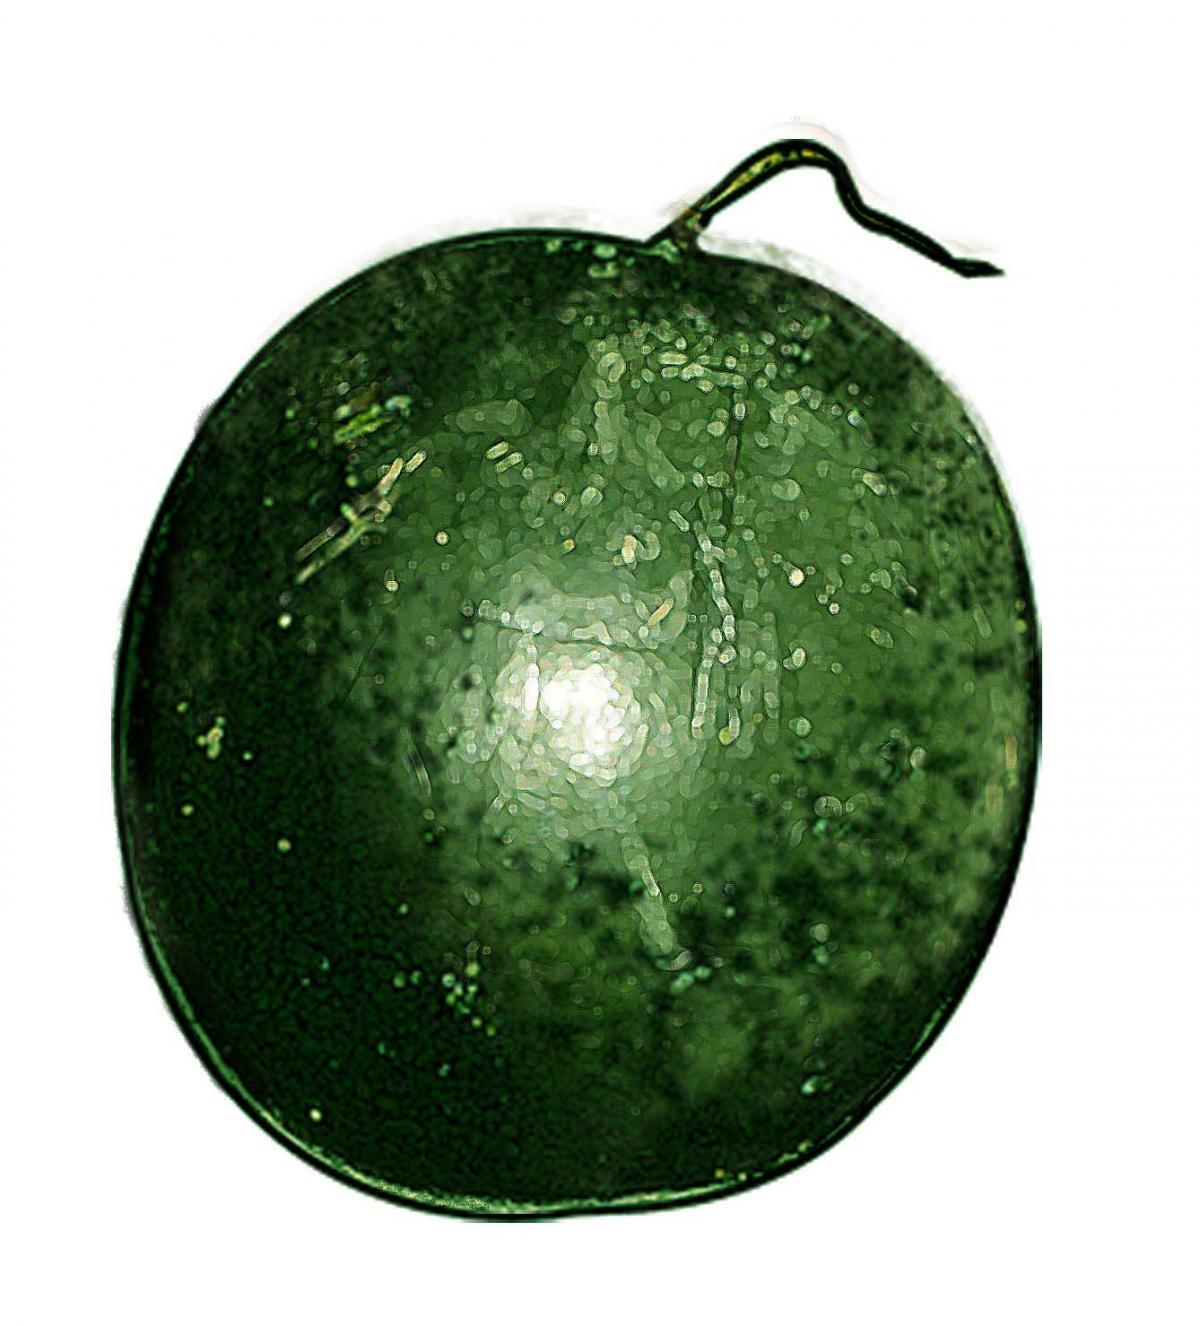 Food - Melon - 00I - Non-country specific